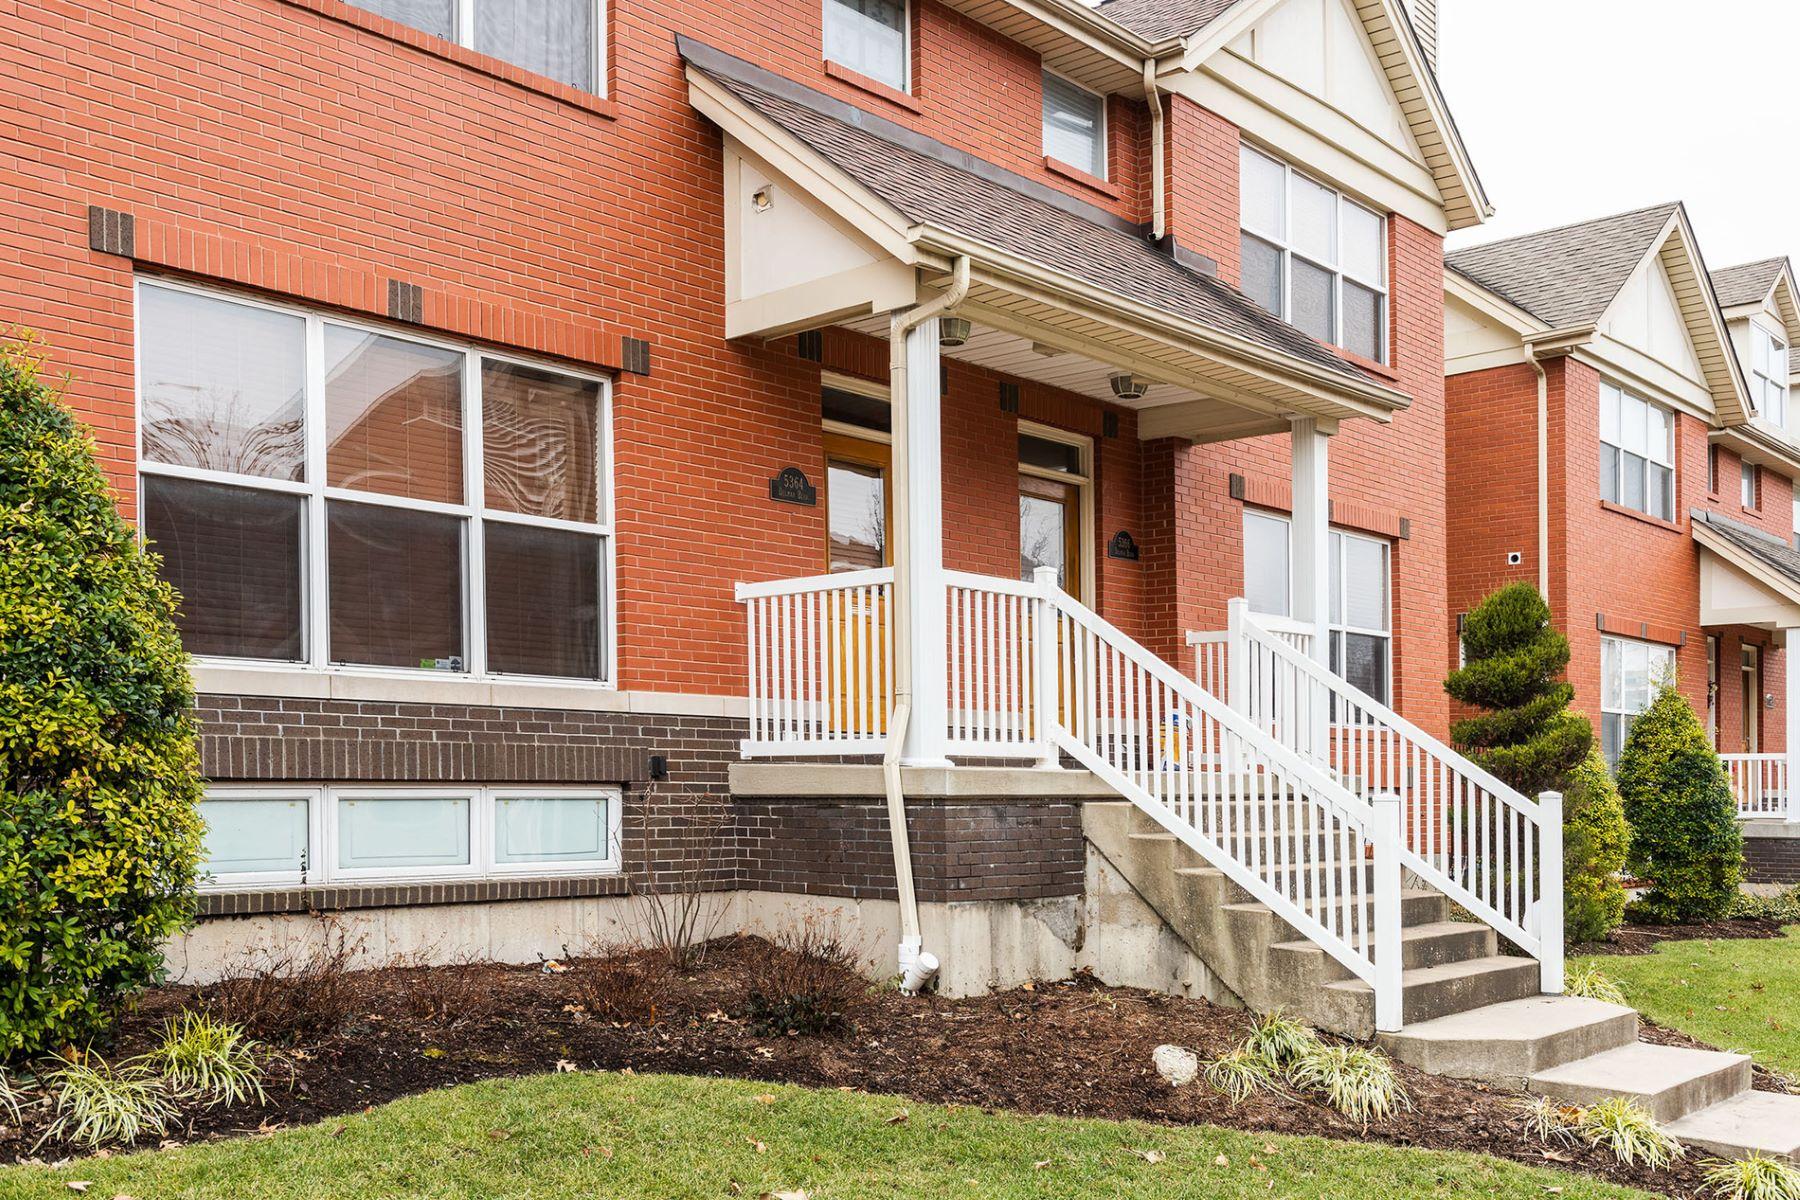 Condominiums for Sale at 5364 Delmar Blvd St. Louis, Missouri 63112 United States